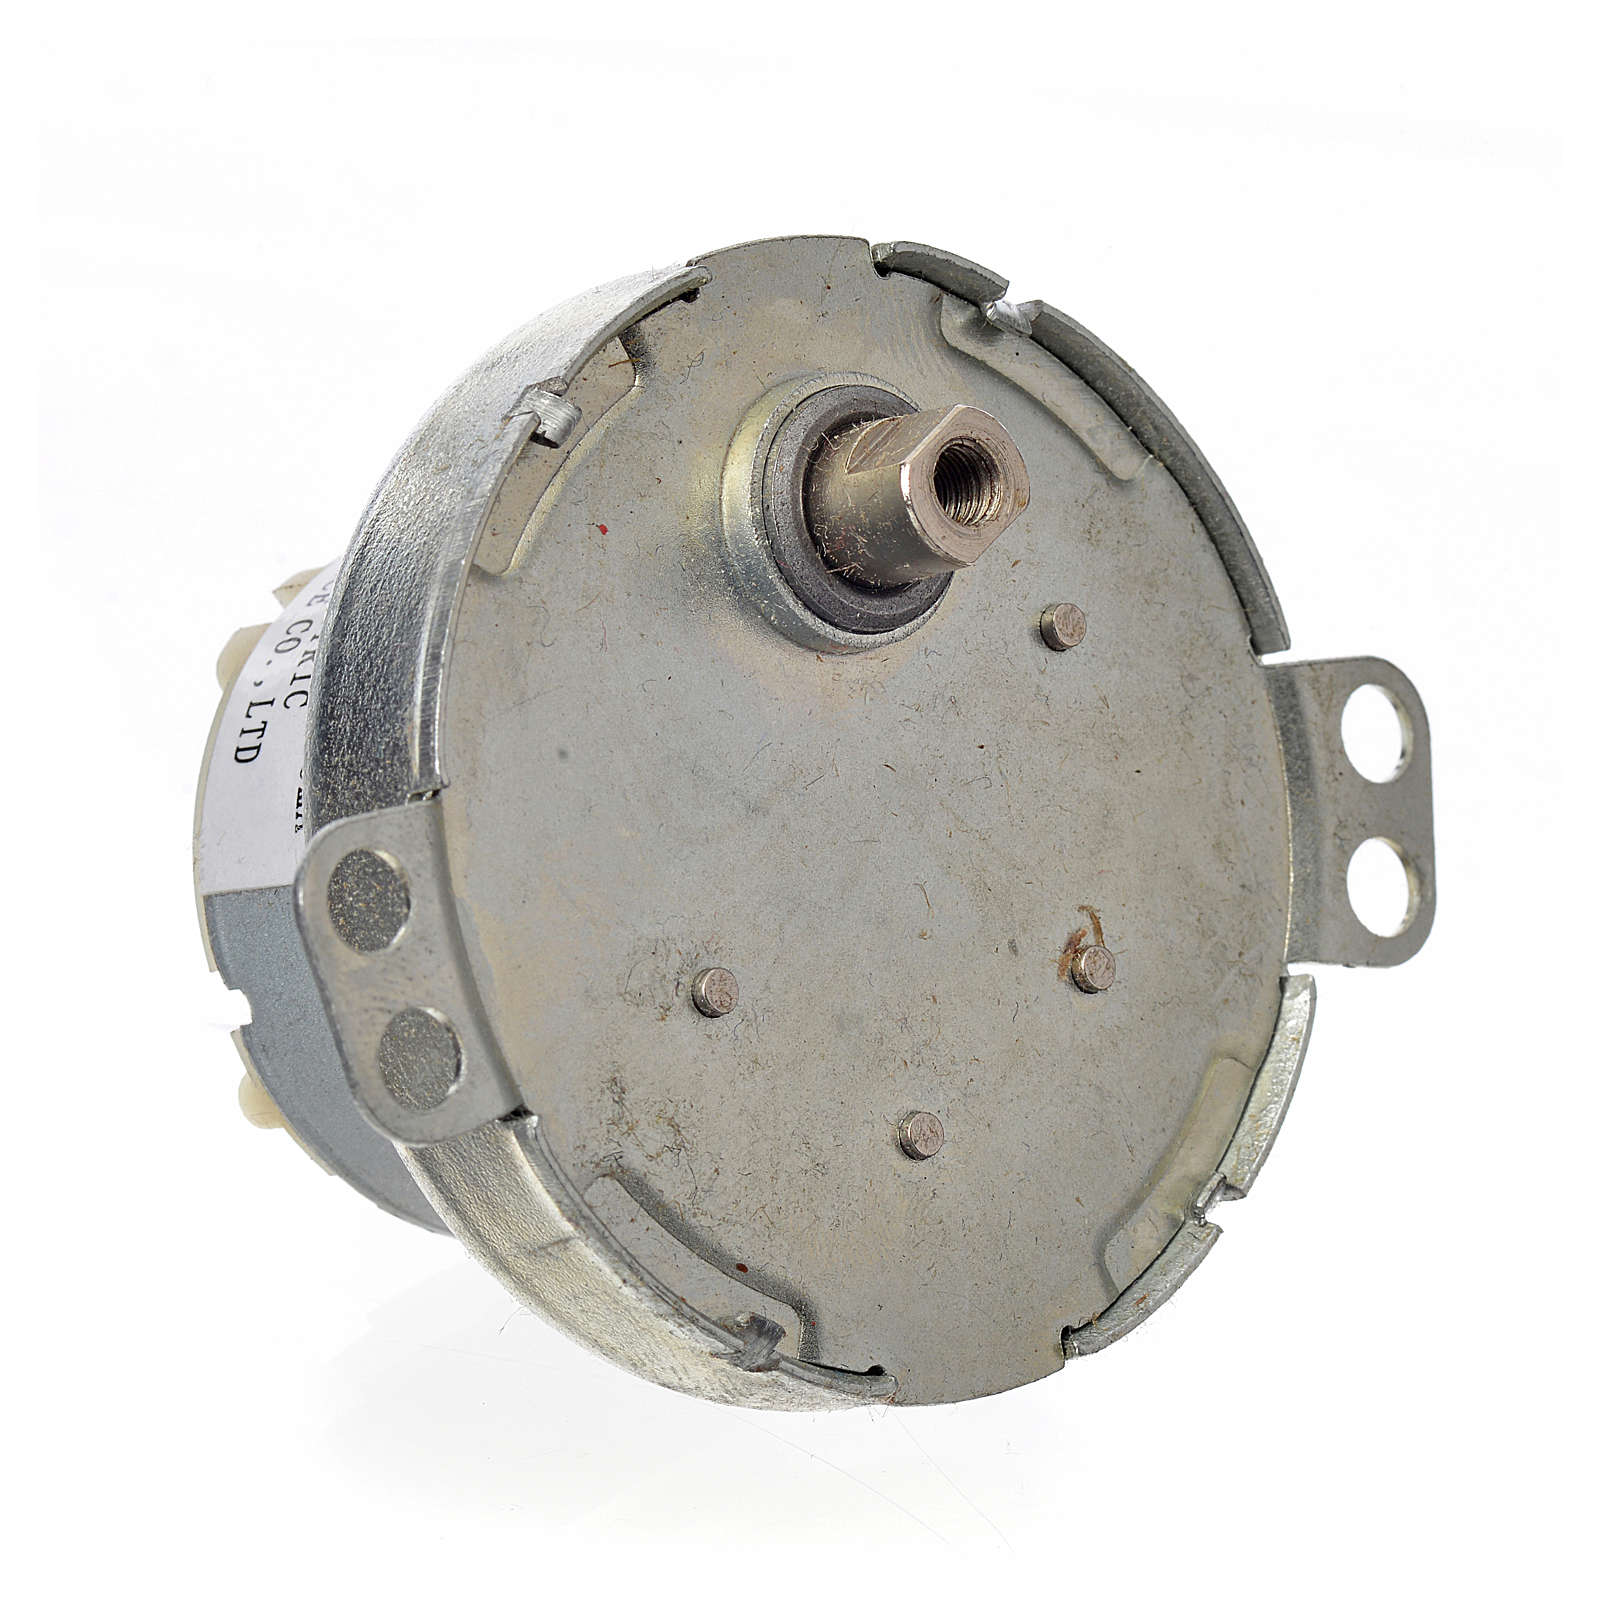 Motoriduttore presepe MCC5 12V 4